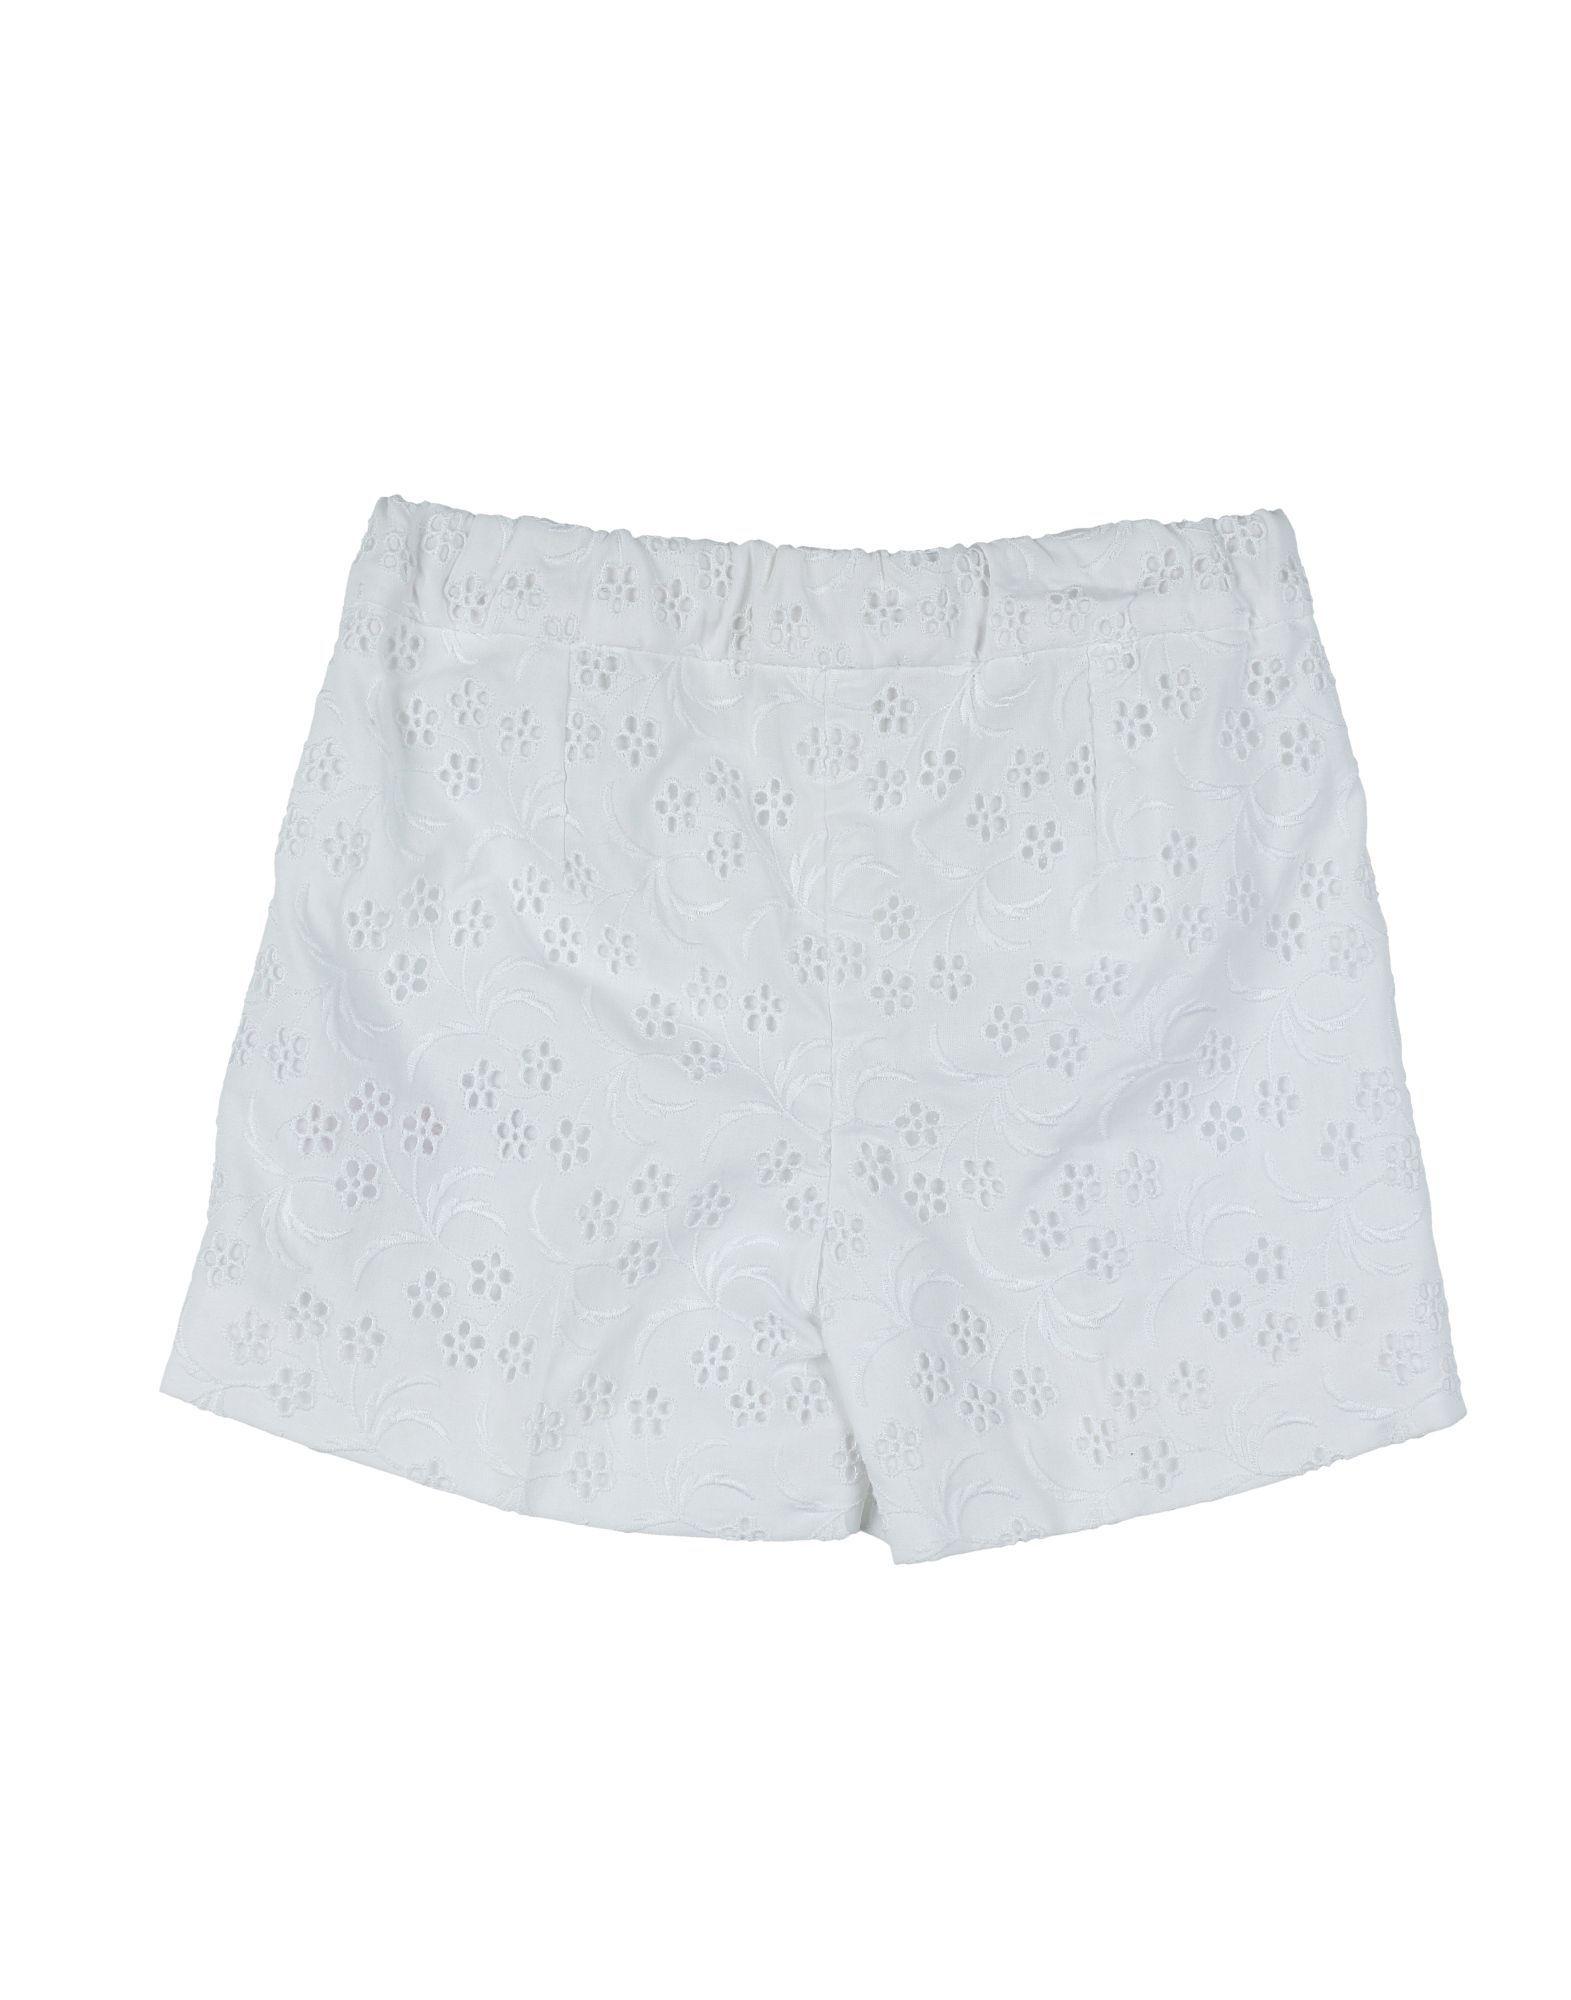 TROUSERS Girl Dolce & Gabbana White Cotton